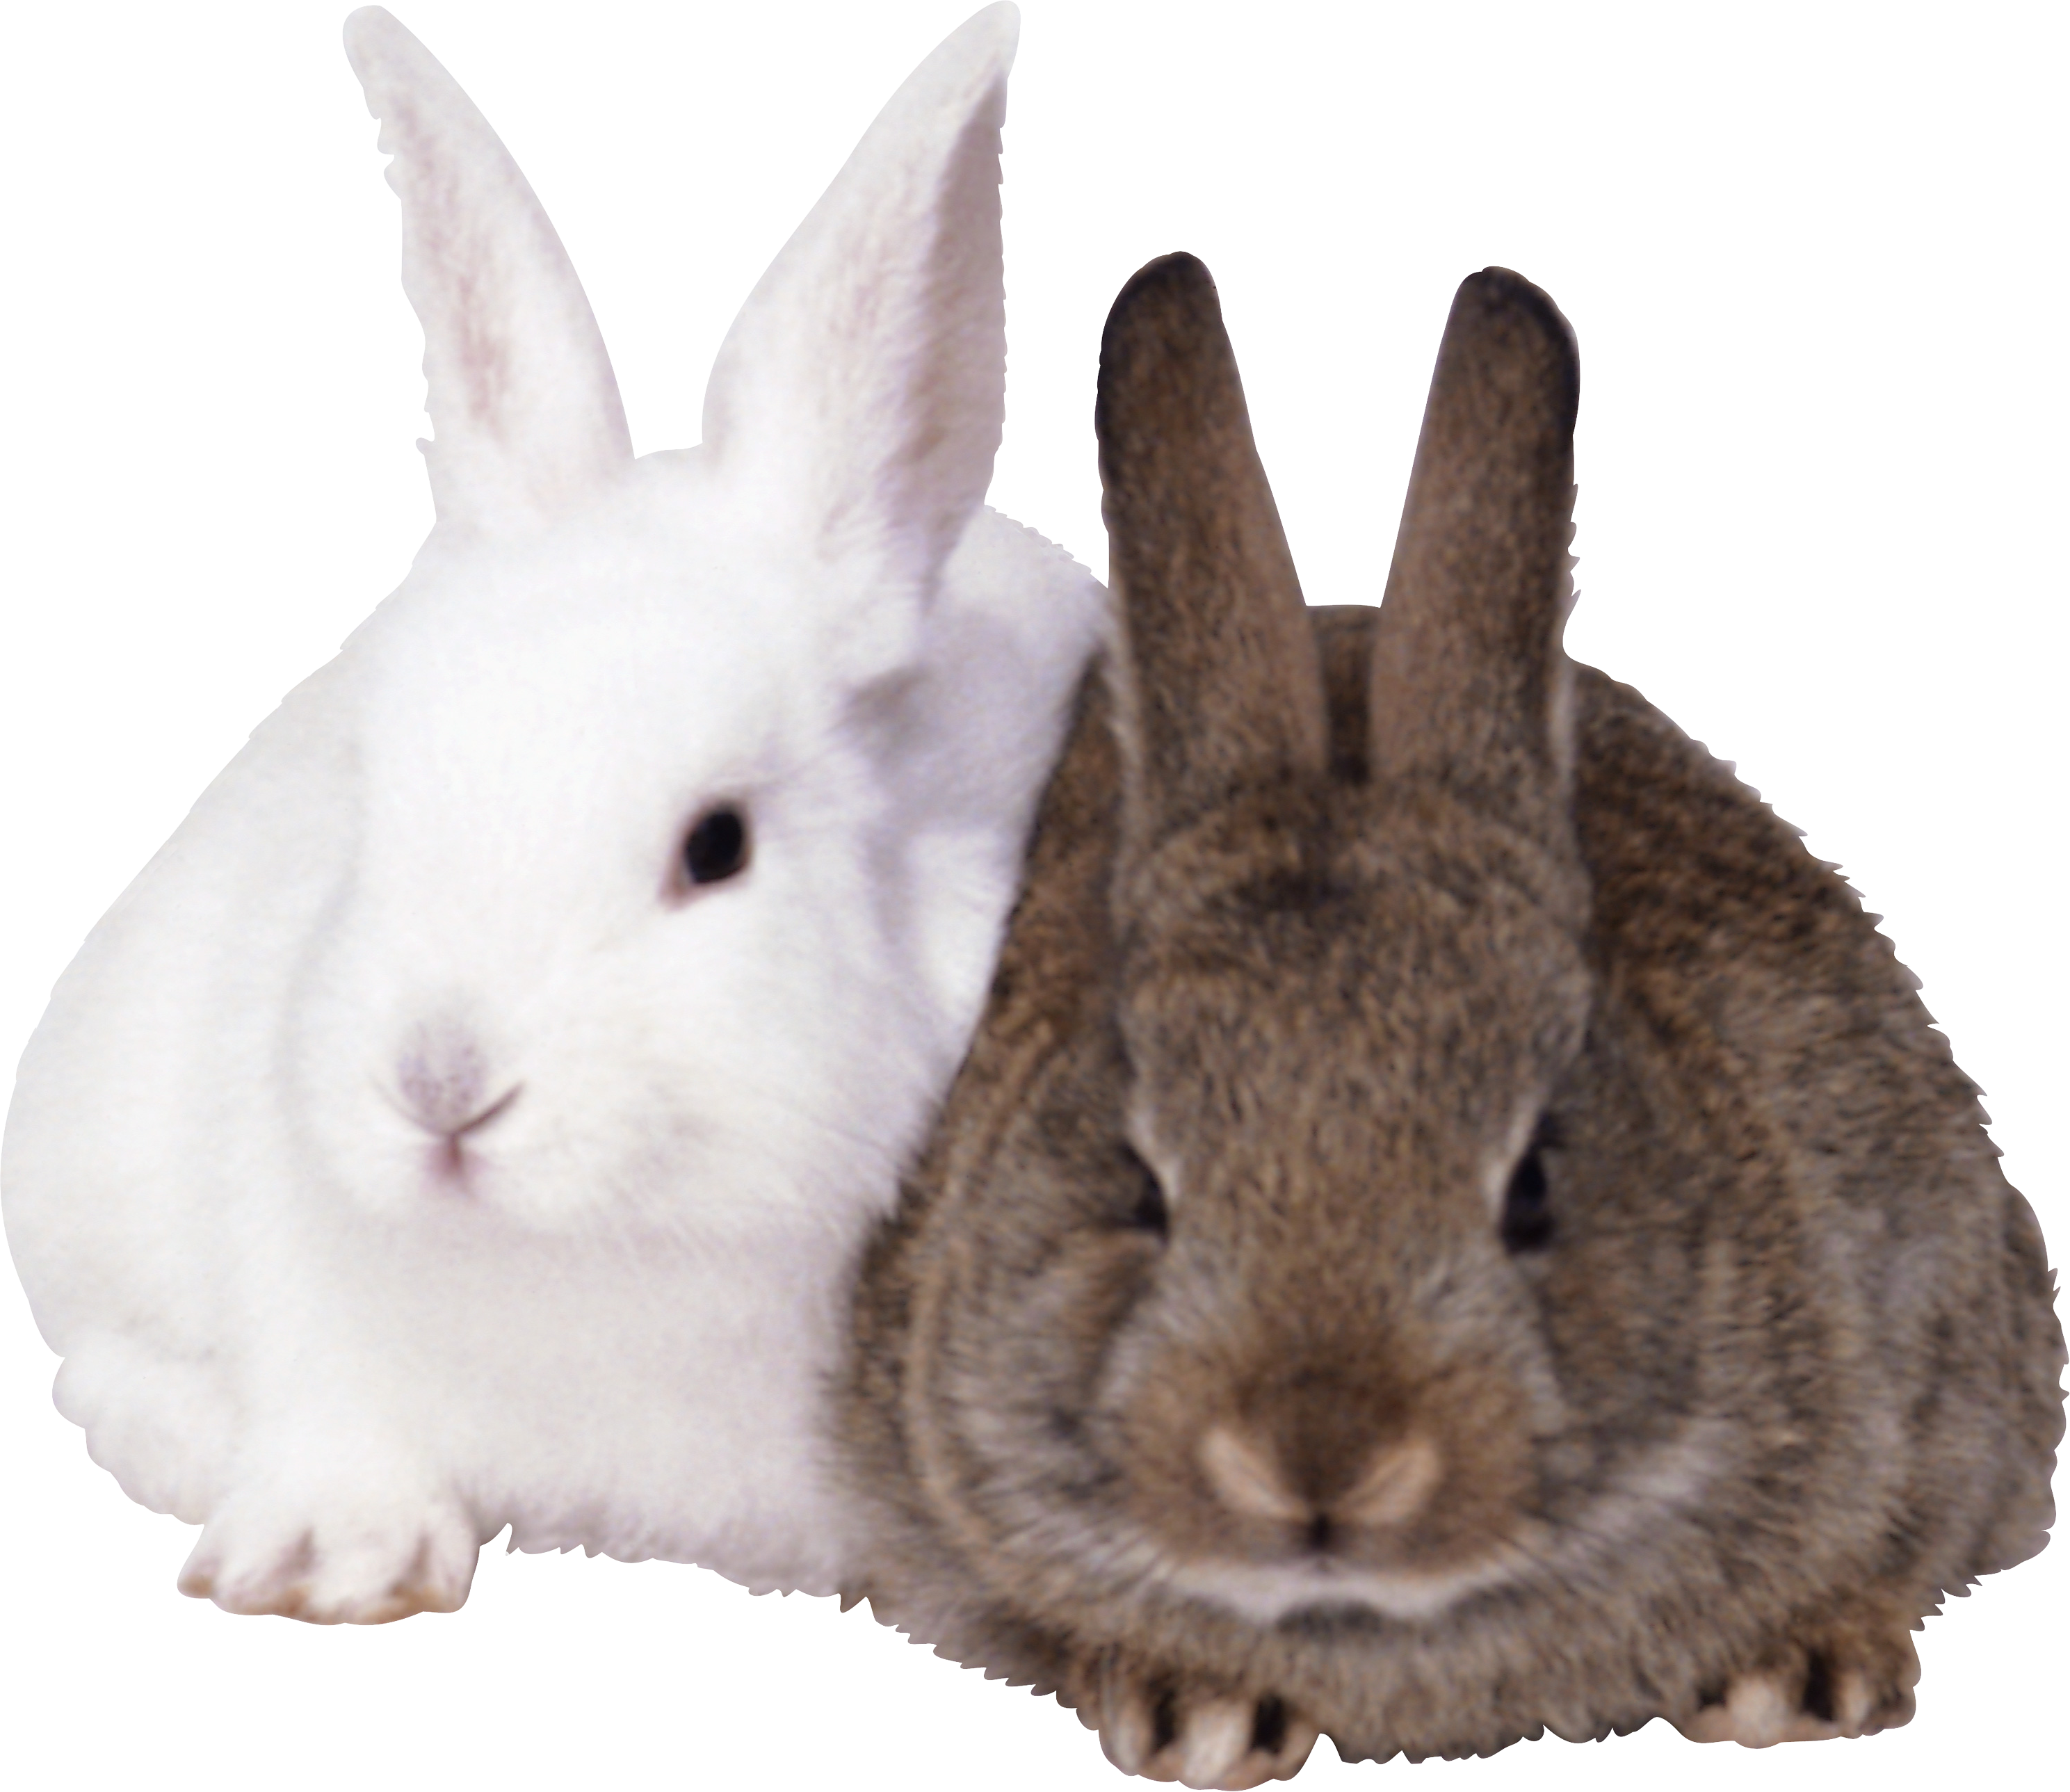 Rabbit PNG - 2873